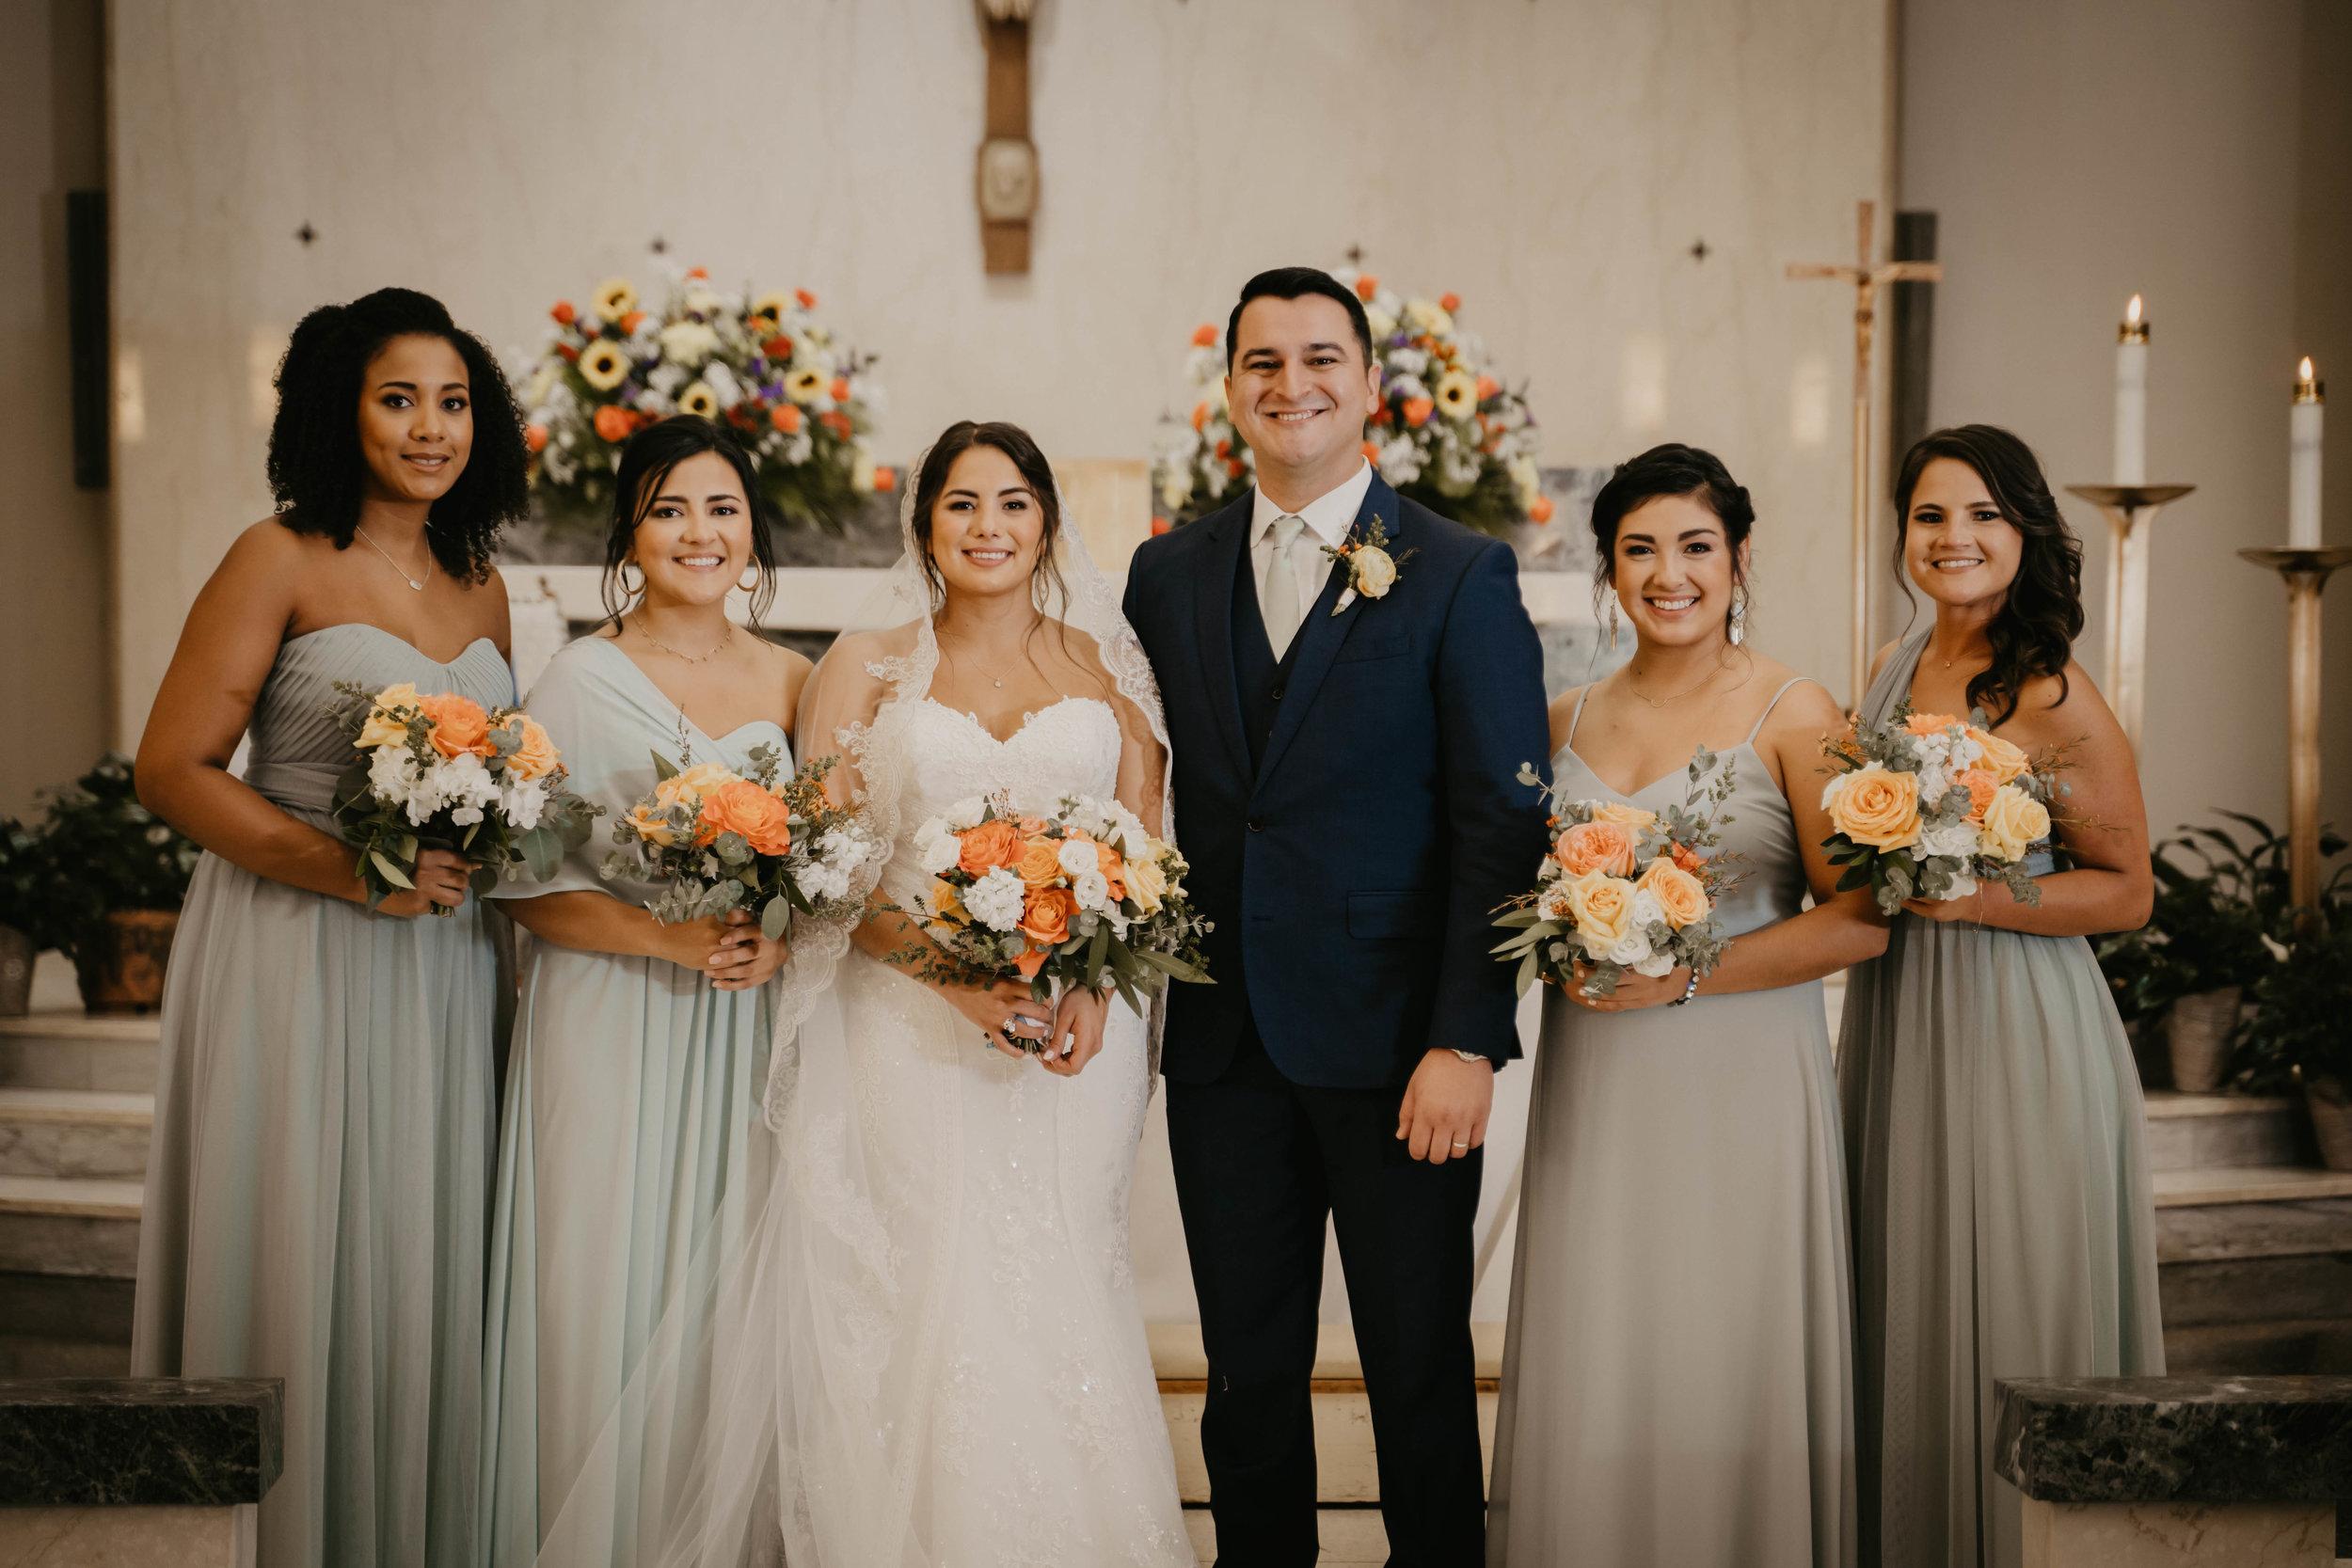 austin-wedding-videographer (33 of 999).jpg